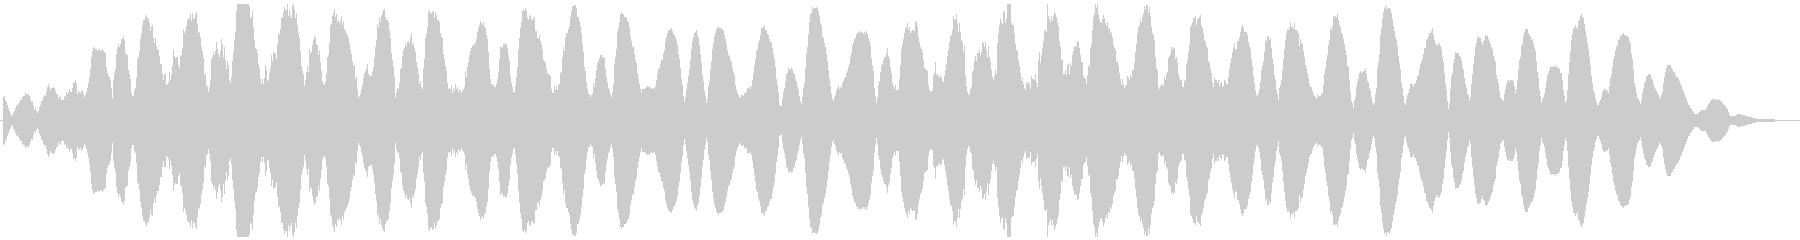 PADS 単調な旋風01の未再生の波形